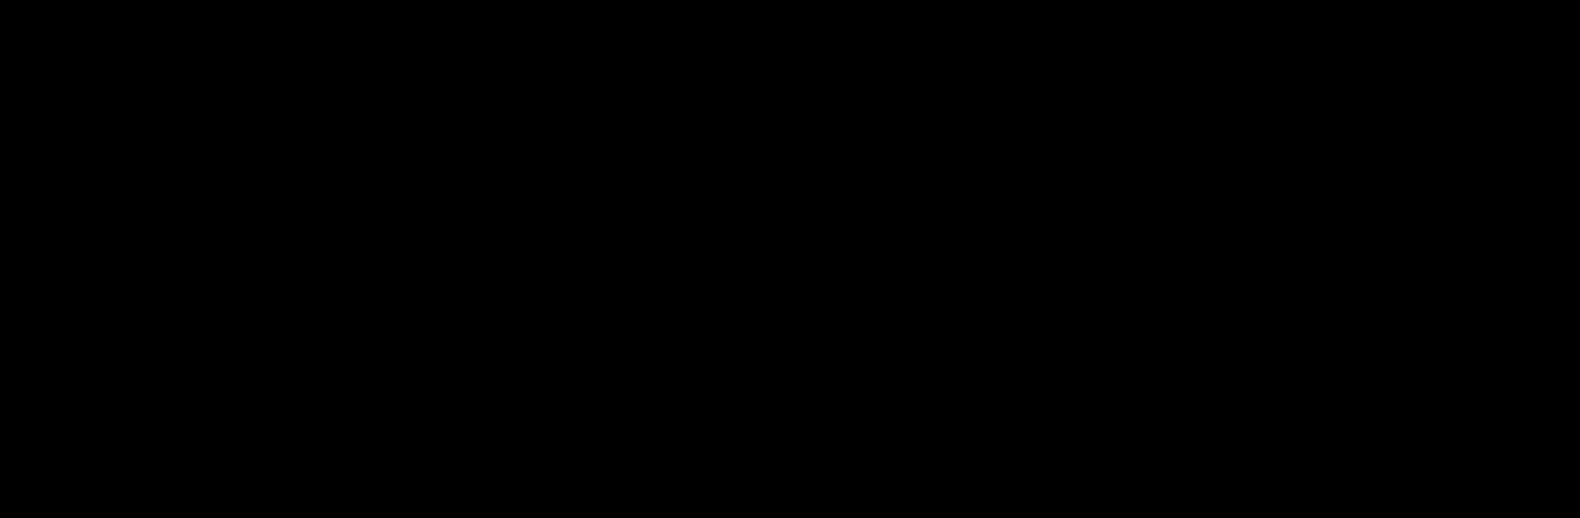 Vignette-1 - Black Line Shadow Png | Full Size PNG Download